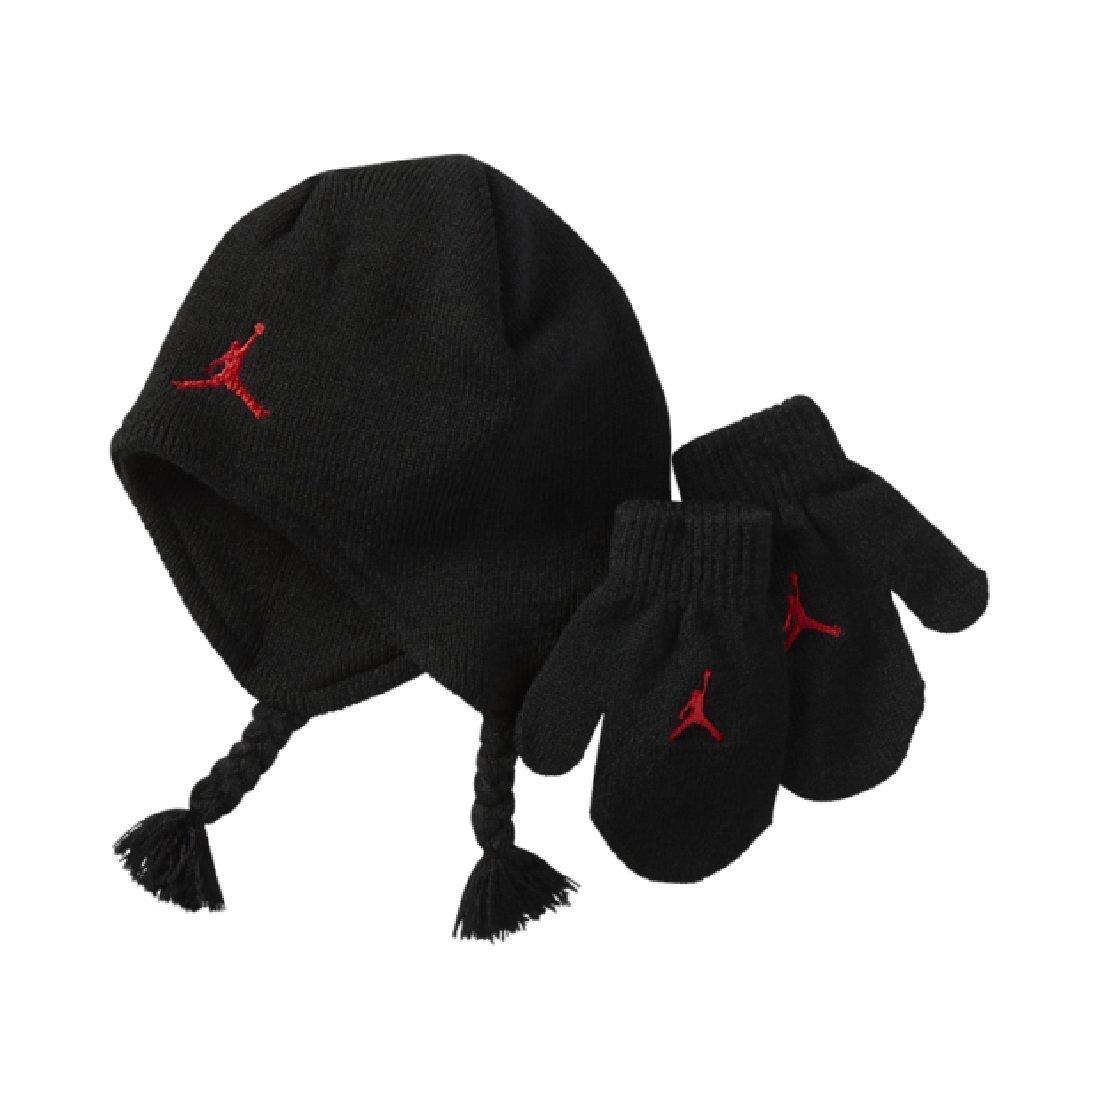 Amazon.com  Nike Air Jordan Black Knit Hat   Mittens Set (12 24 Months)   Sports   Outdoors ce5cc531324